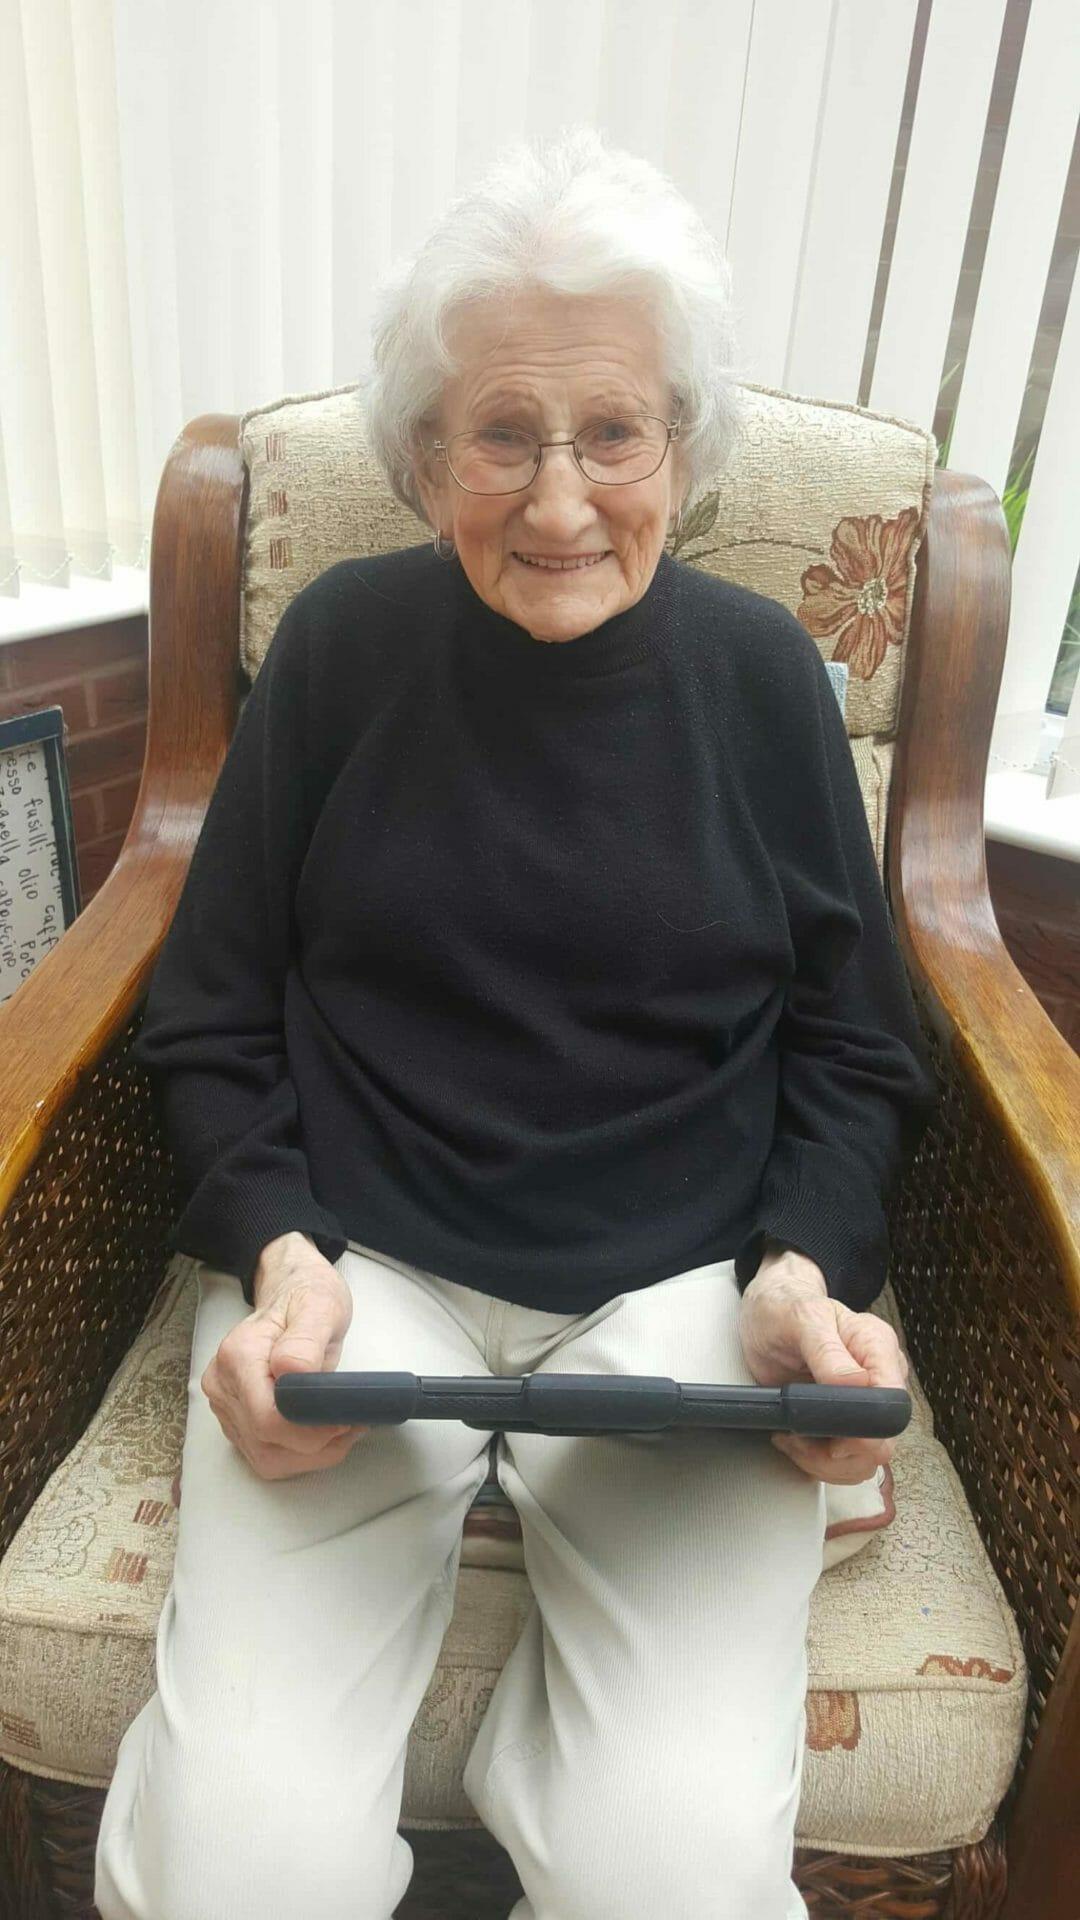 Using digital technology Deafblind UK